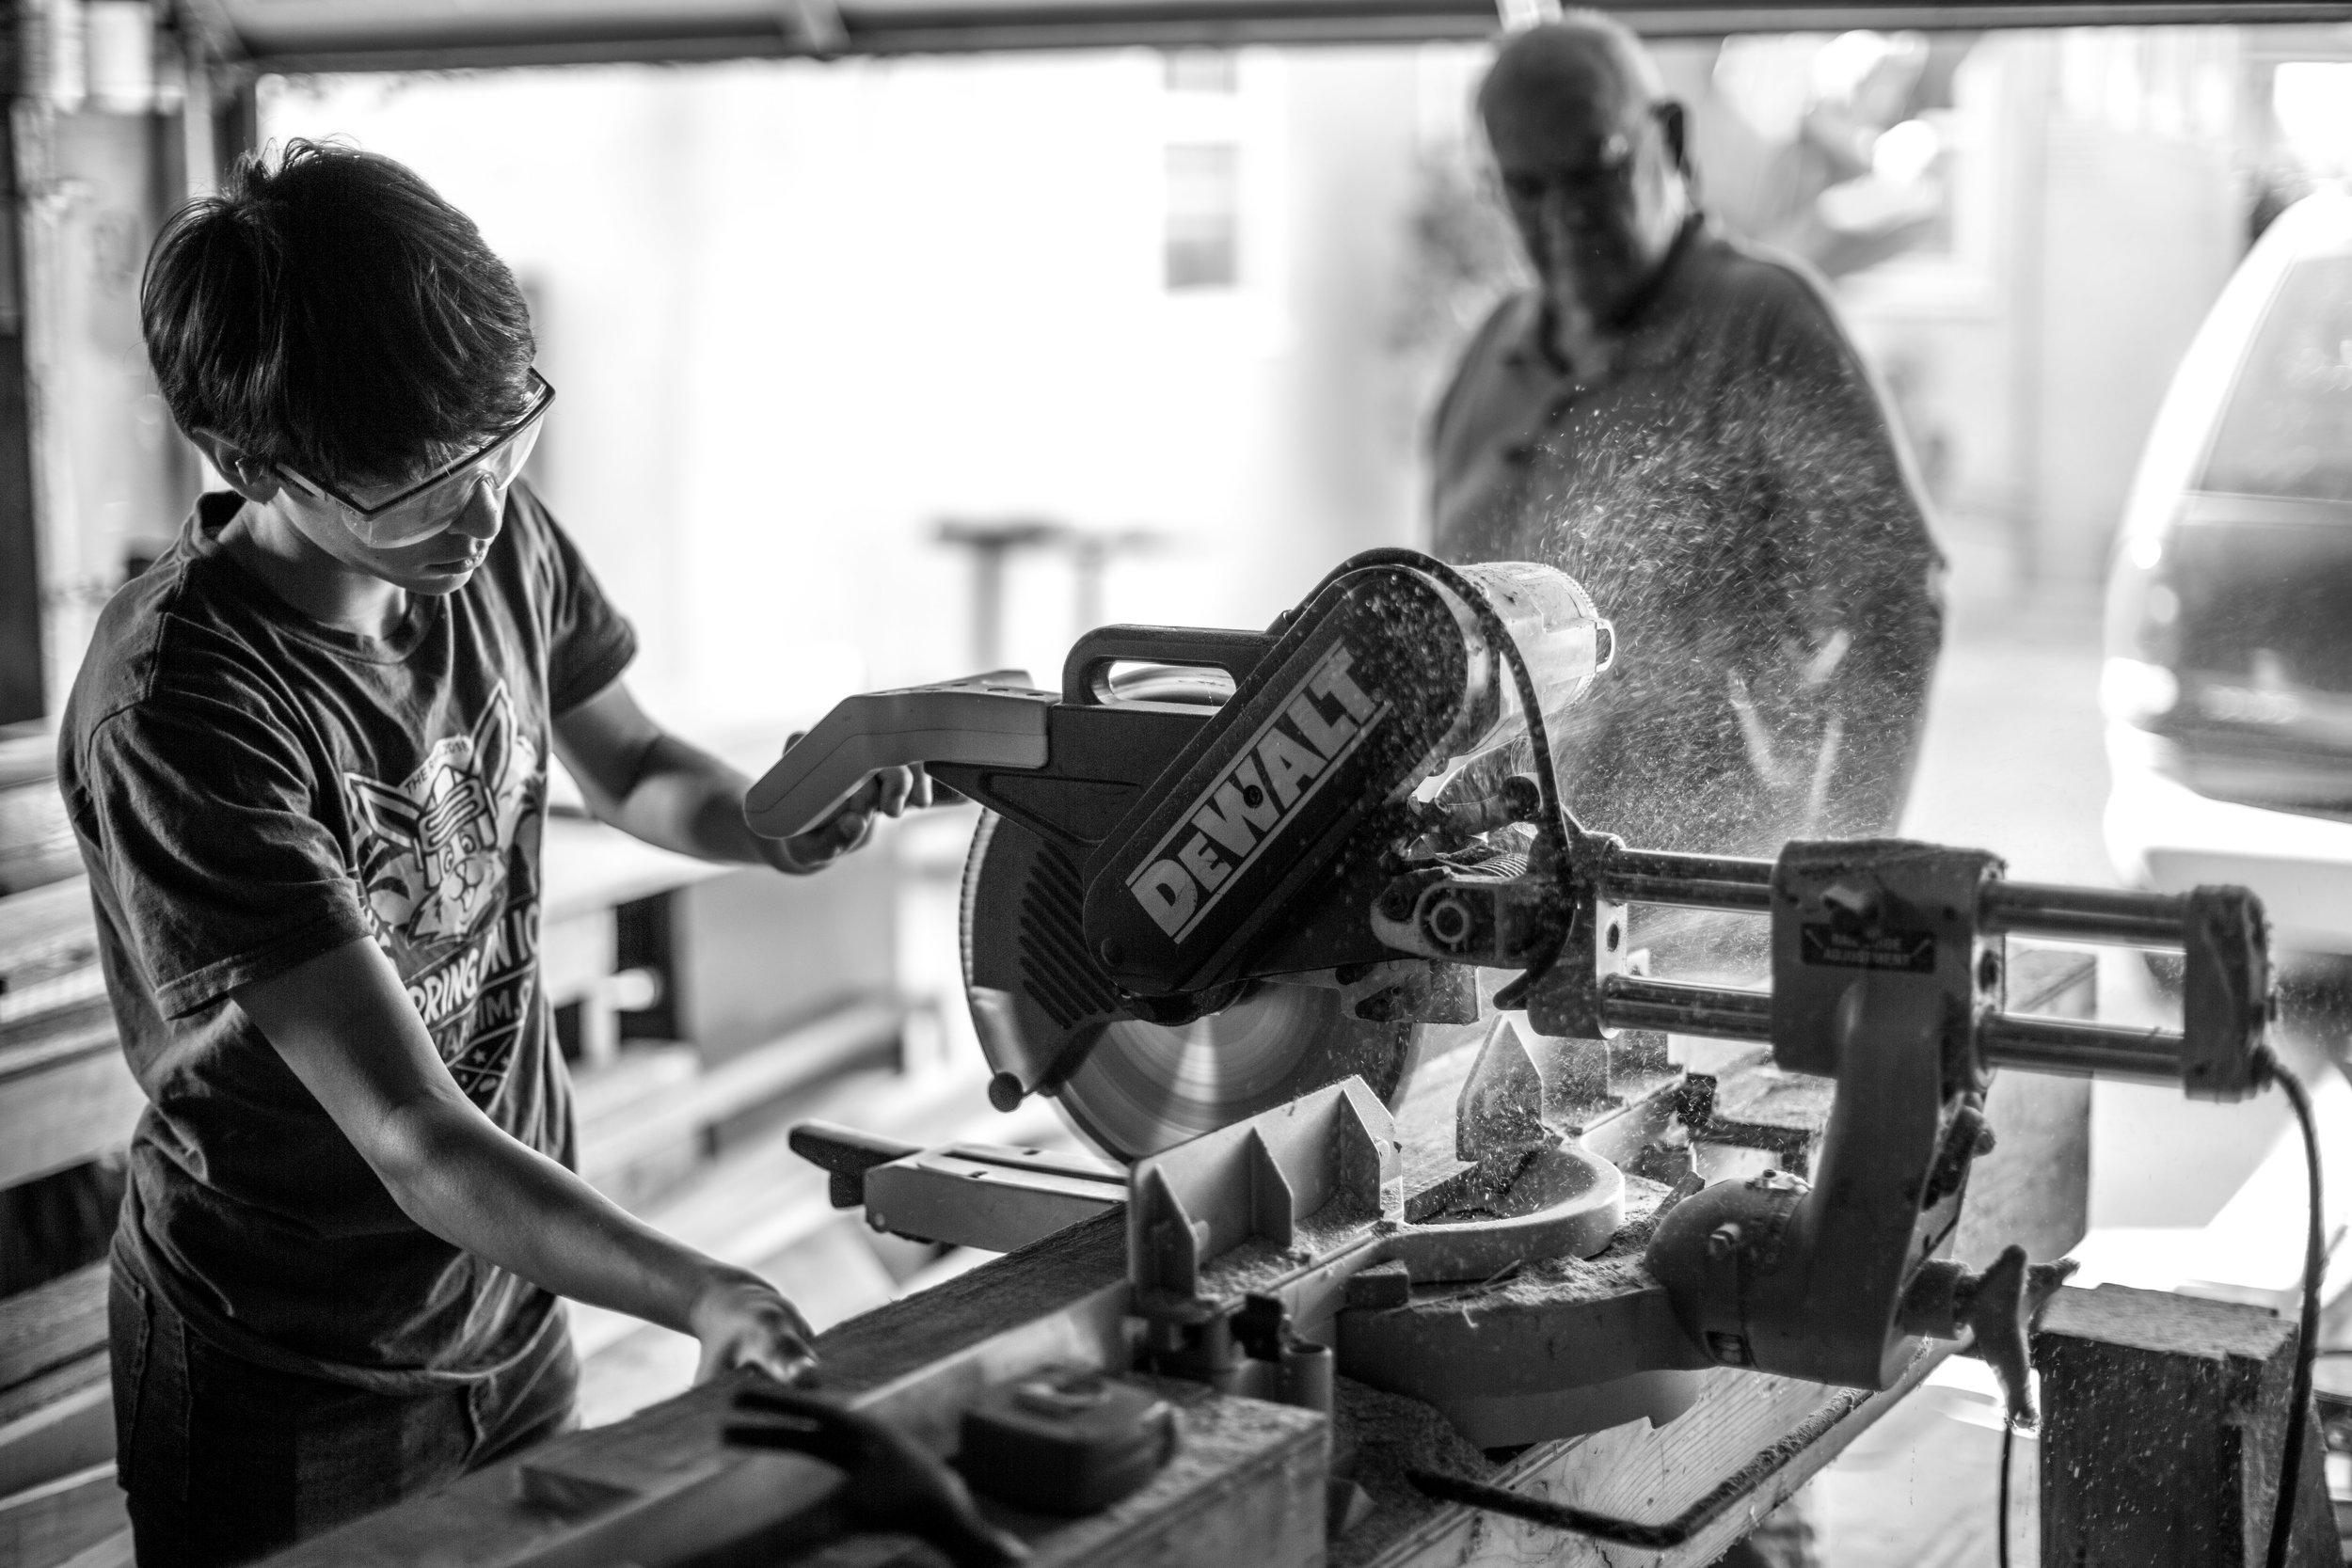 Apprentices - Regulatory Reform - July 2014ARPI DirectorPeter Quinton